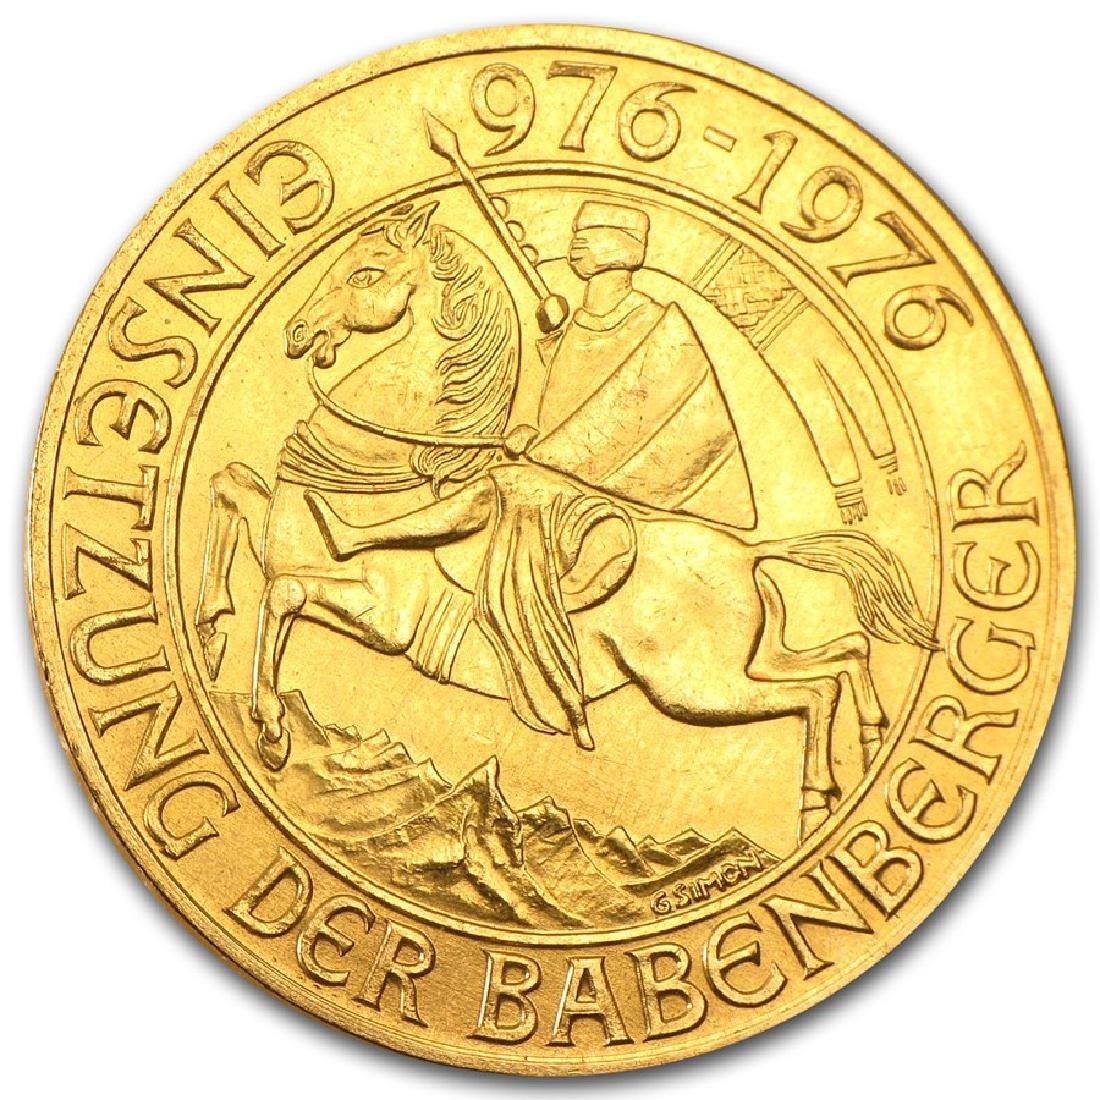 1976 Austria 1000 Schilling Gold Coin